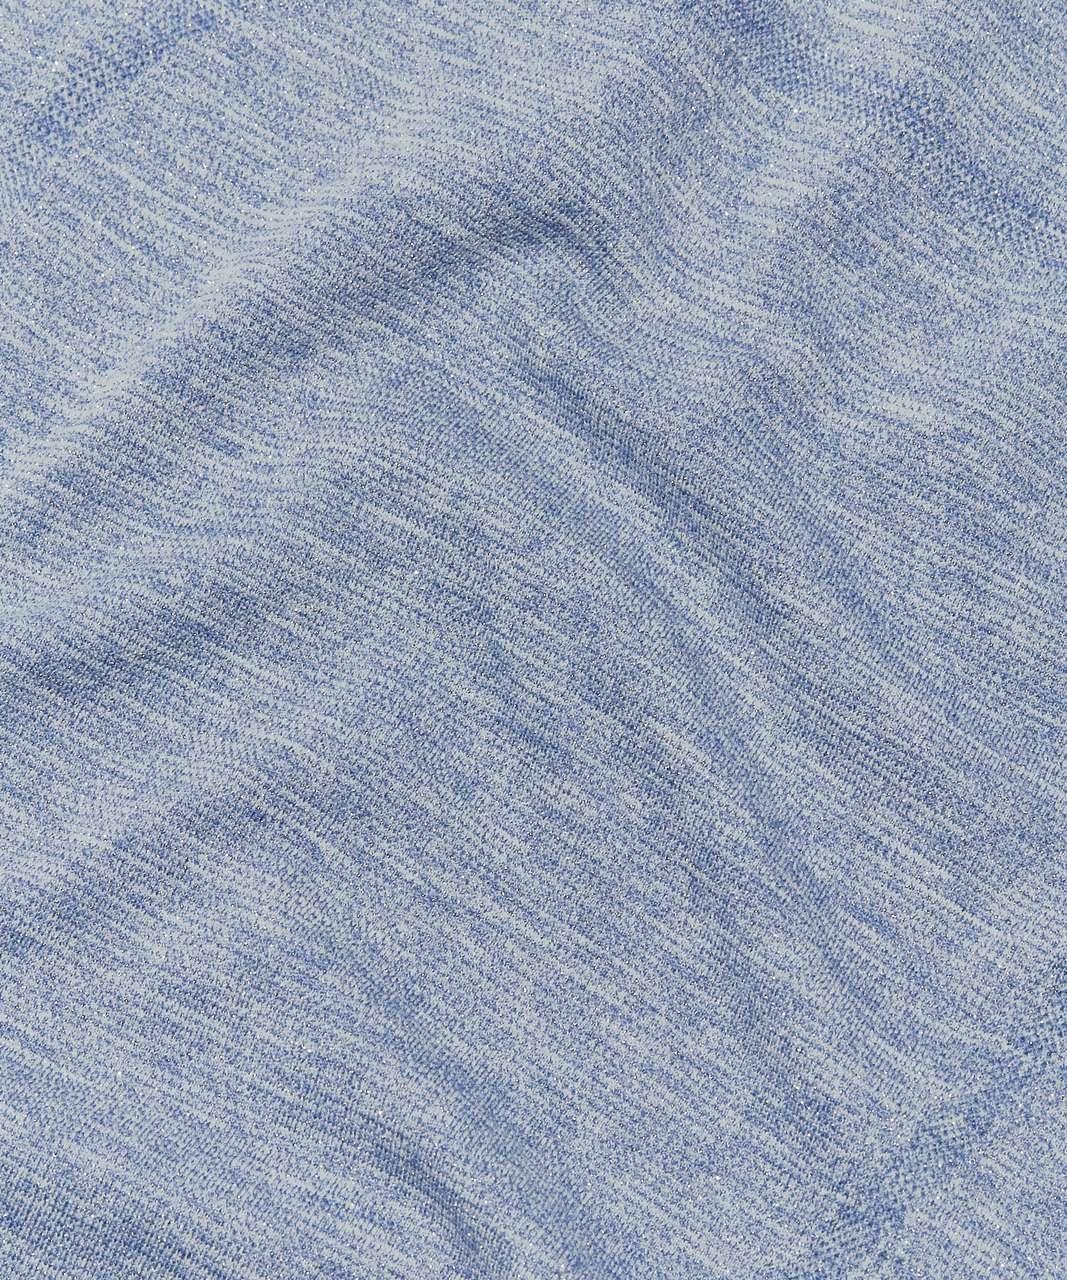 Lululemon Swiftly Tech Short Sleeve Crew *Sparkle - Gatsby Blue / White / Silver